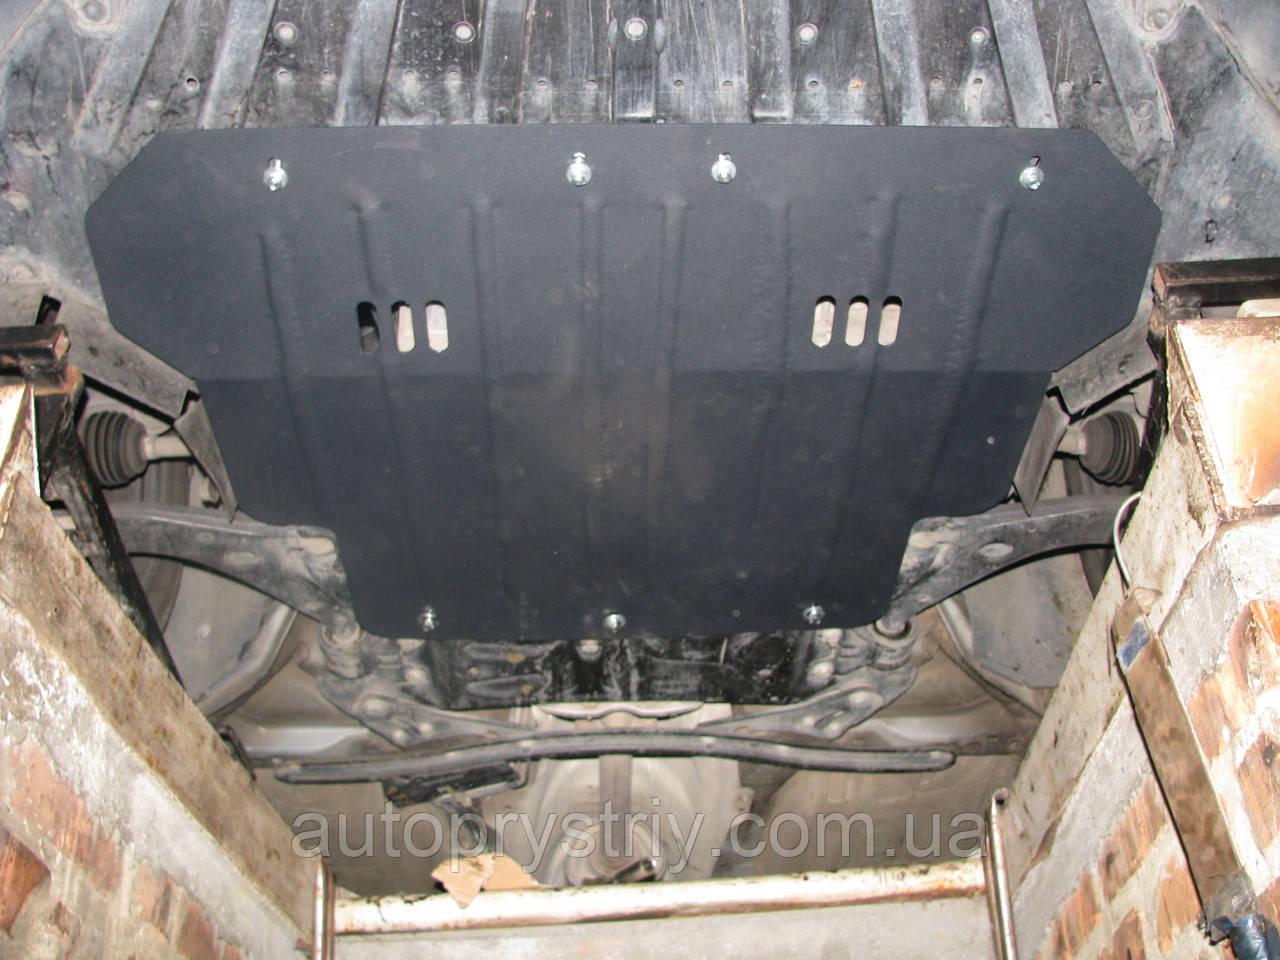 Захист двигуна і КПП Ford Grand C-Max (2010--) механіка 1.0